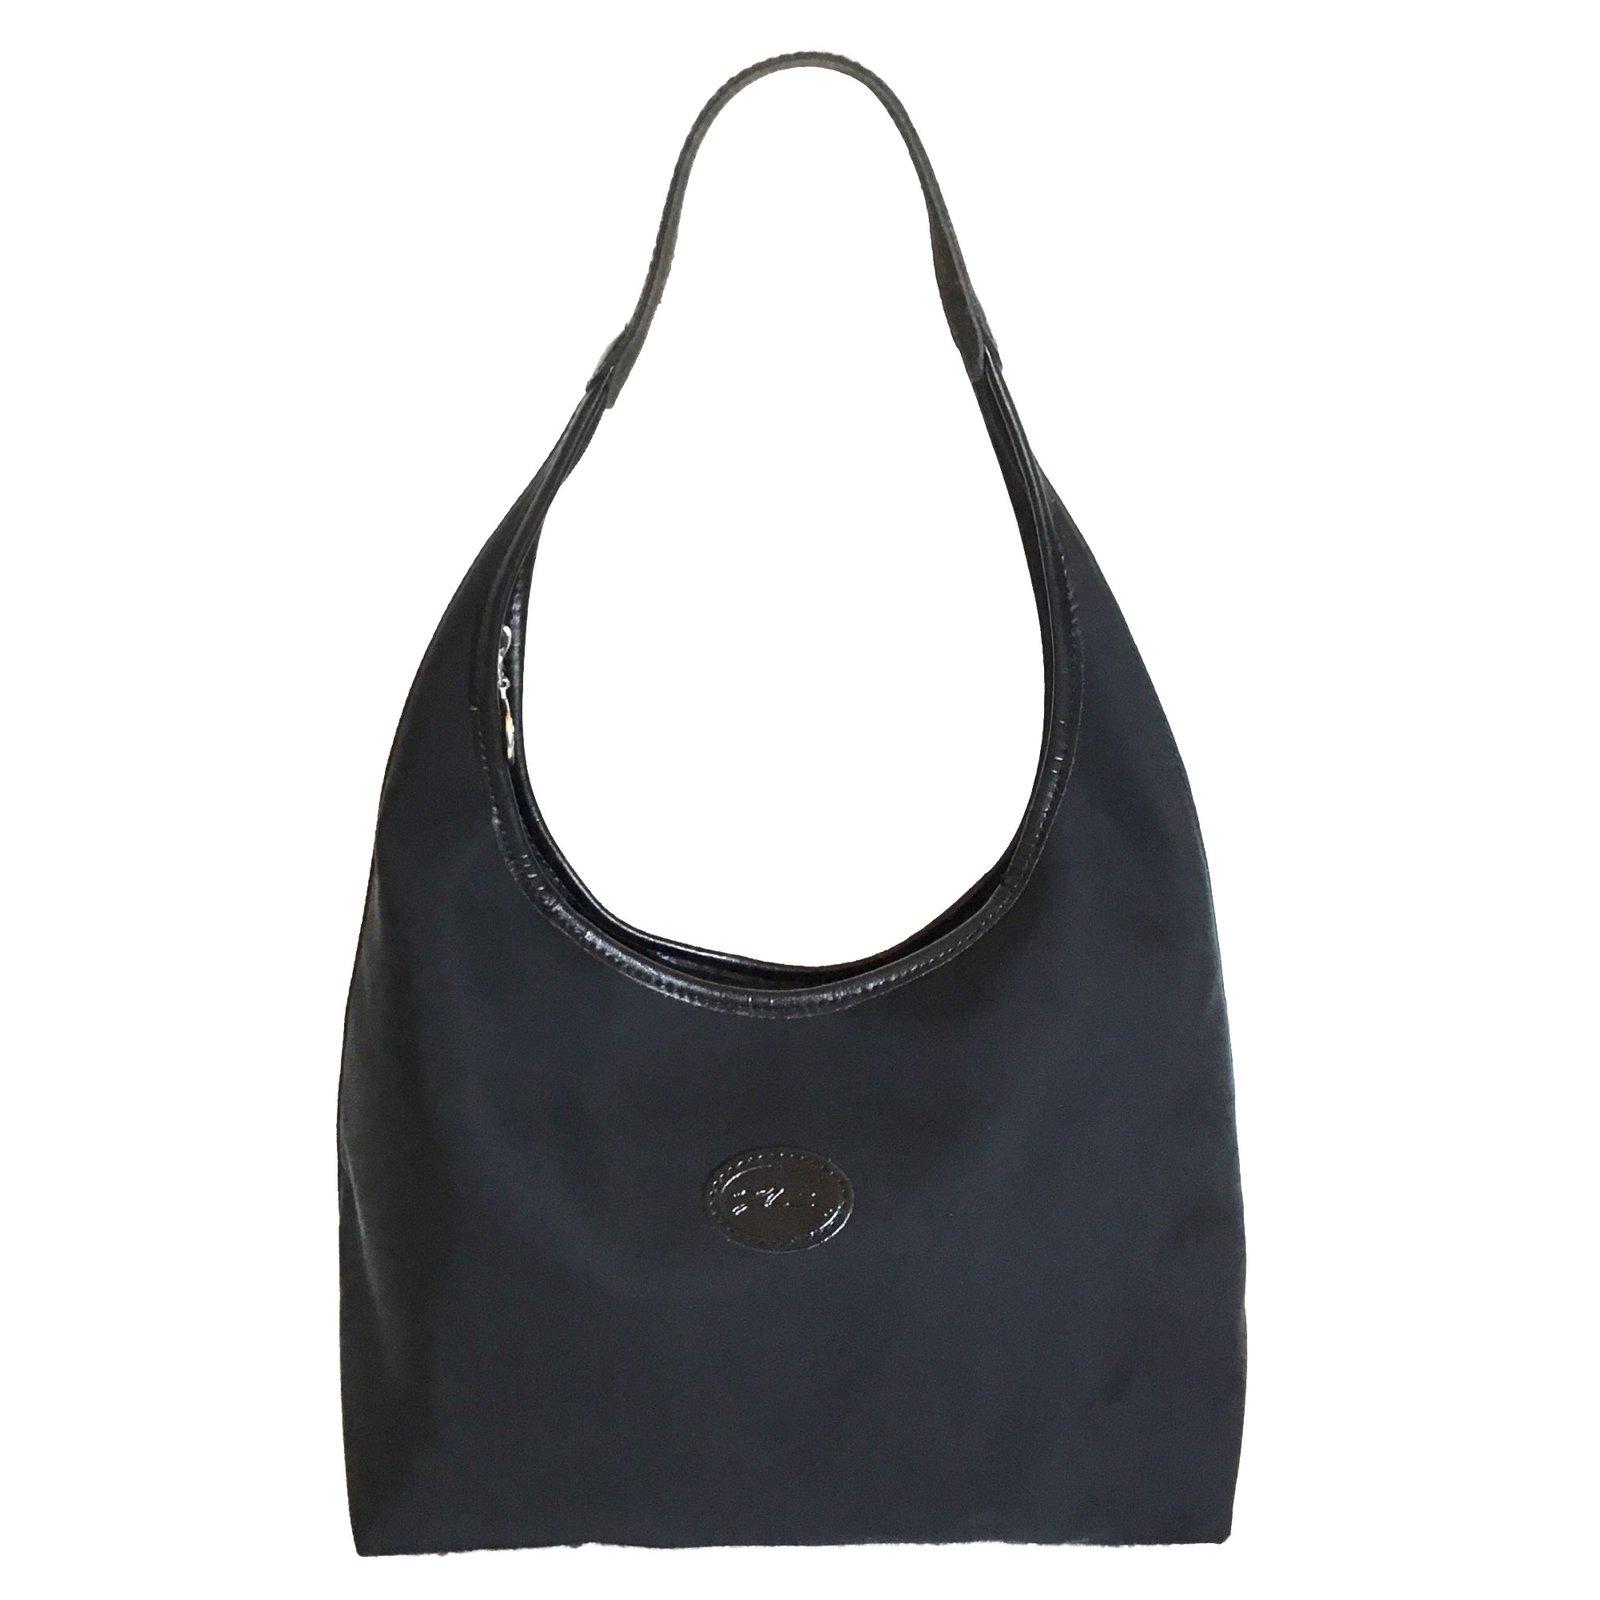 a1382470c5f5f Sacs à main Longchamp Sac à main Cuir,Nylon Noir ref.74541 - Joli Closet